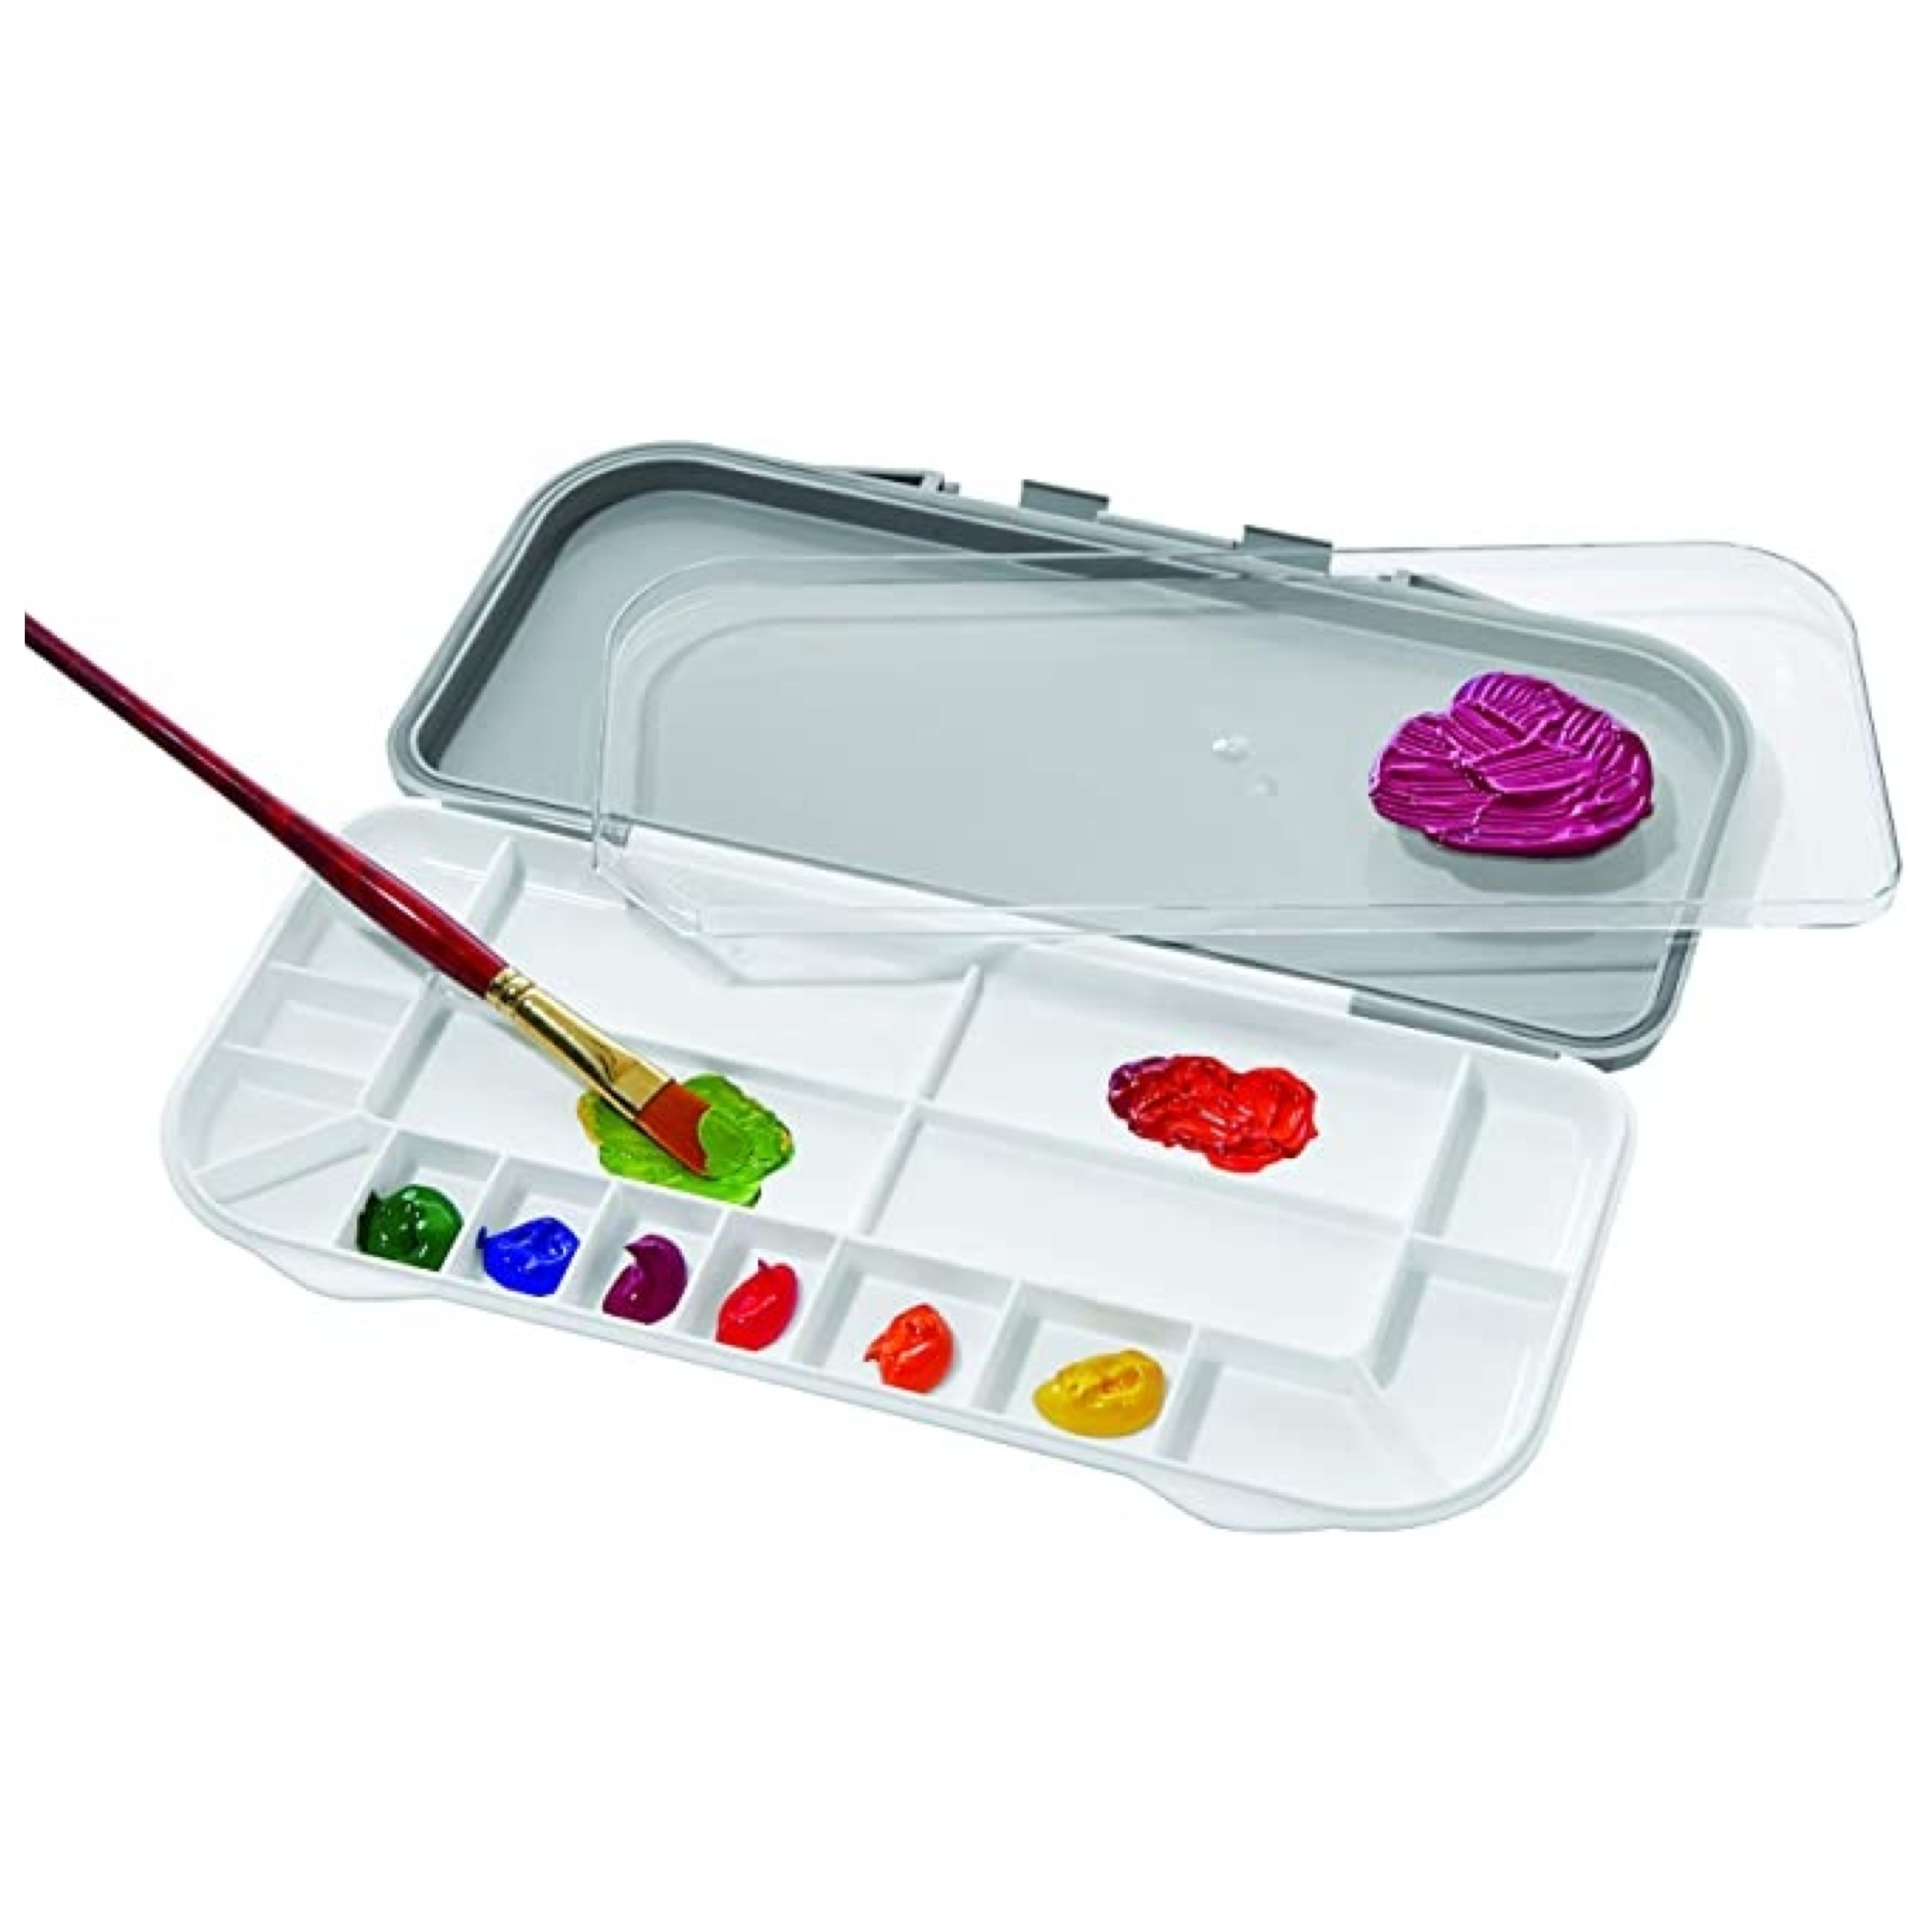 Paint Saver